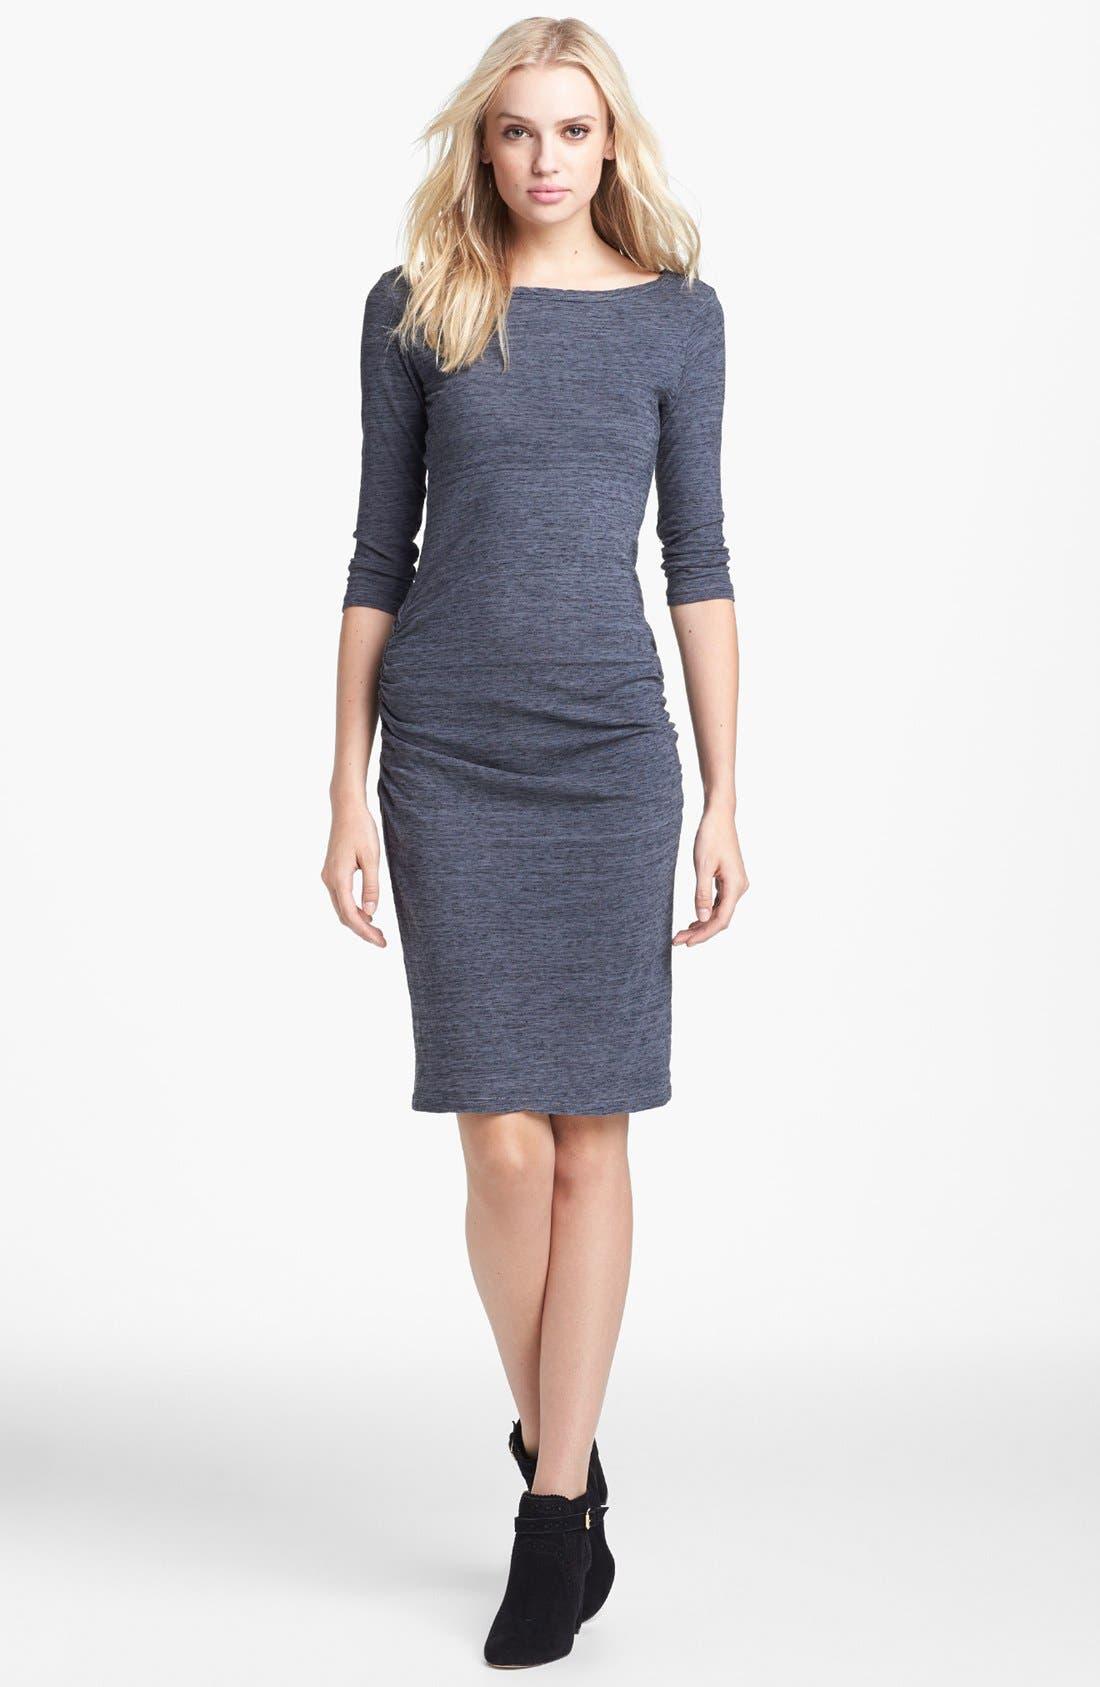 Alternate Image 1 Selected - James Perse Jewel Neck Dress